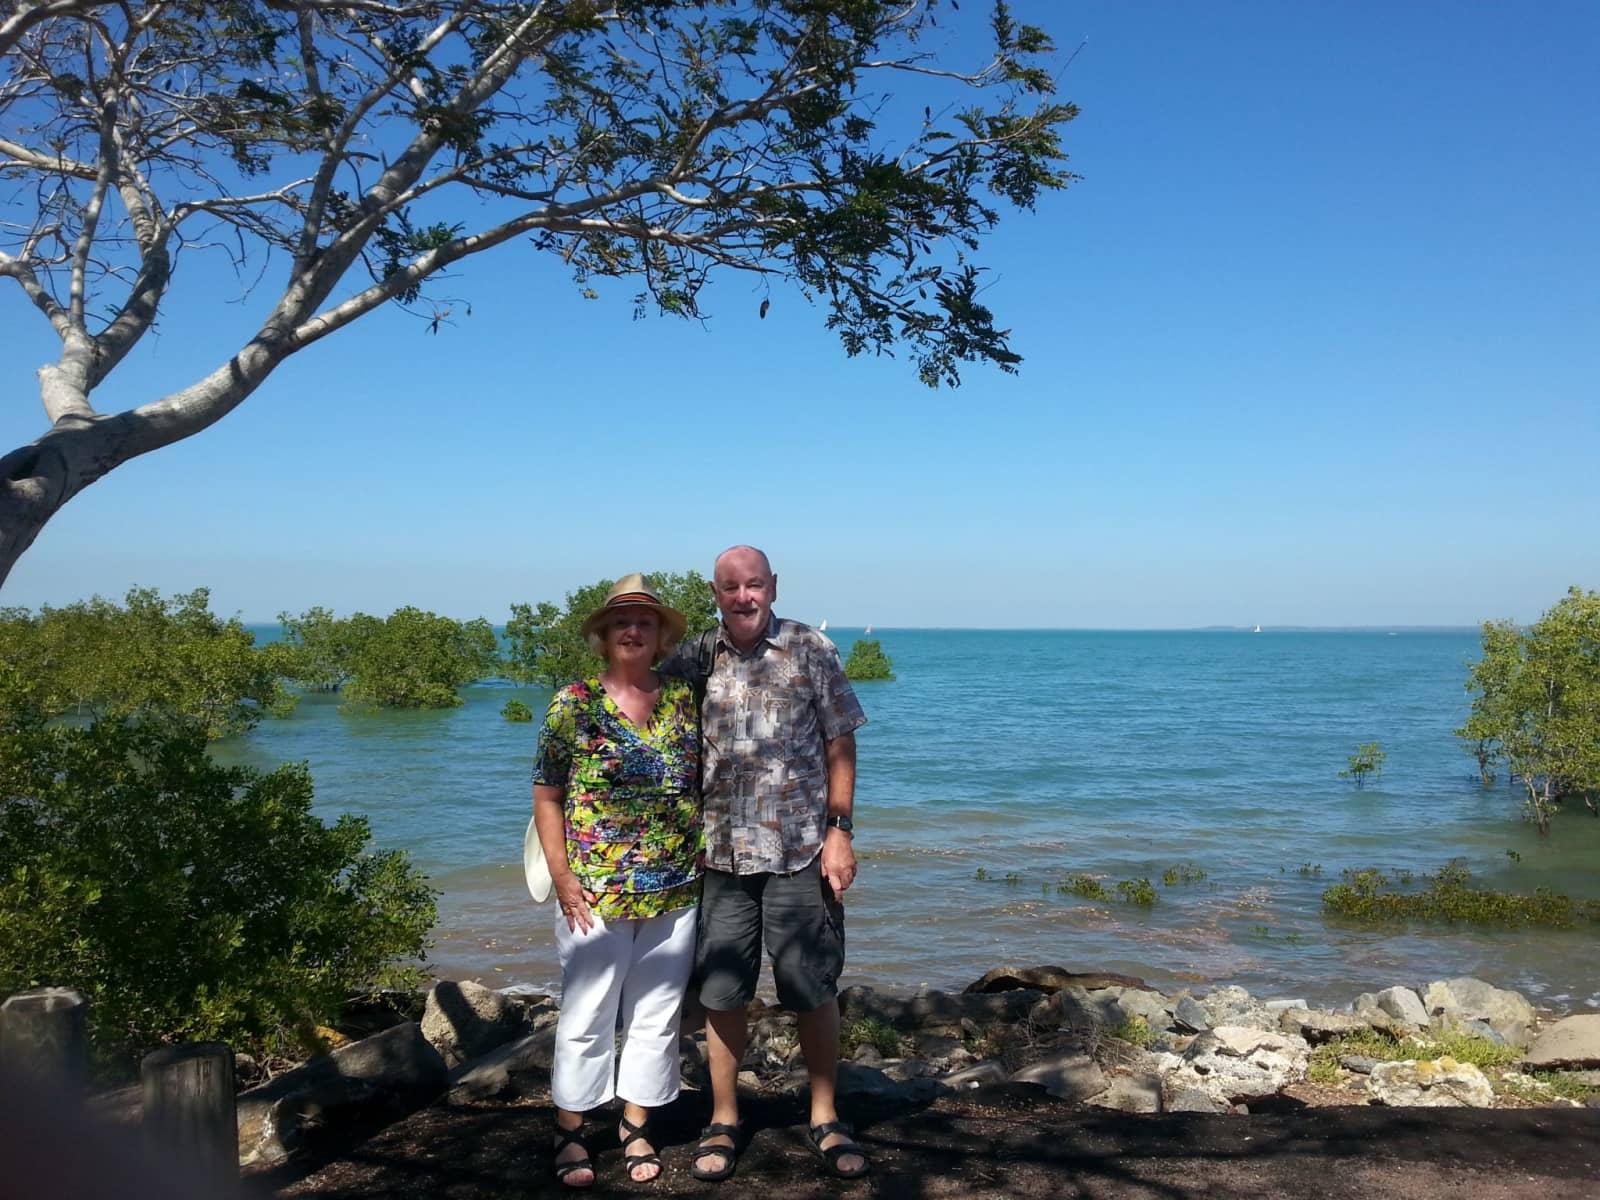 Richard & Linda from Mandurah, Western Australia, Australia